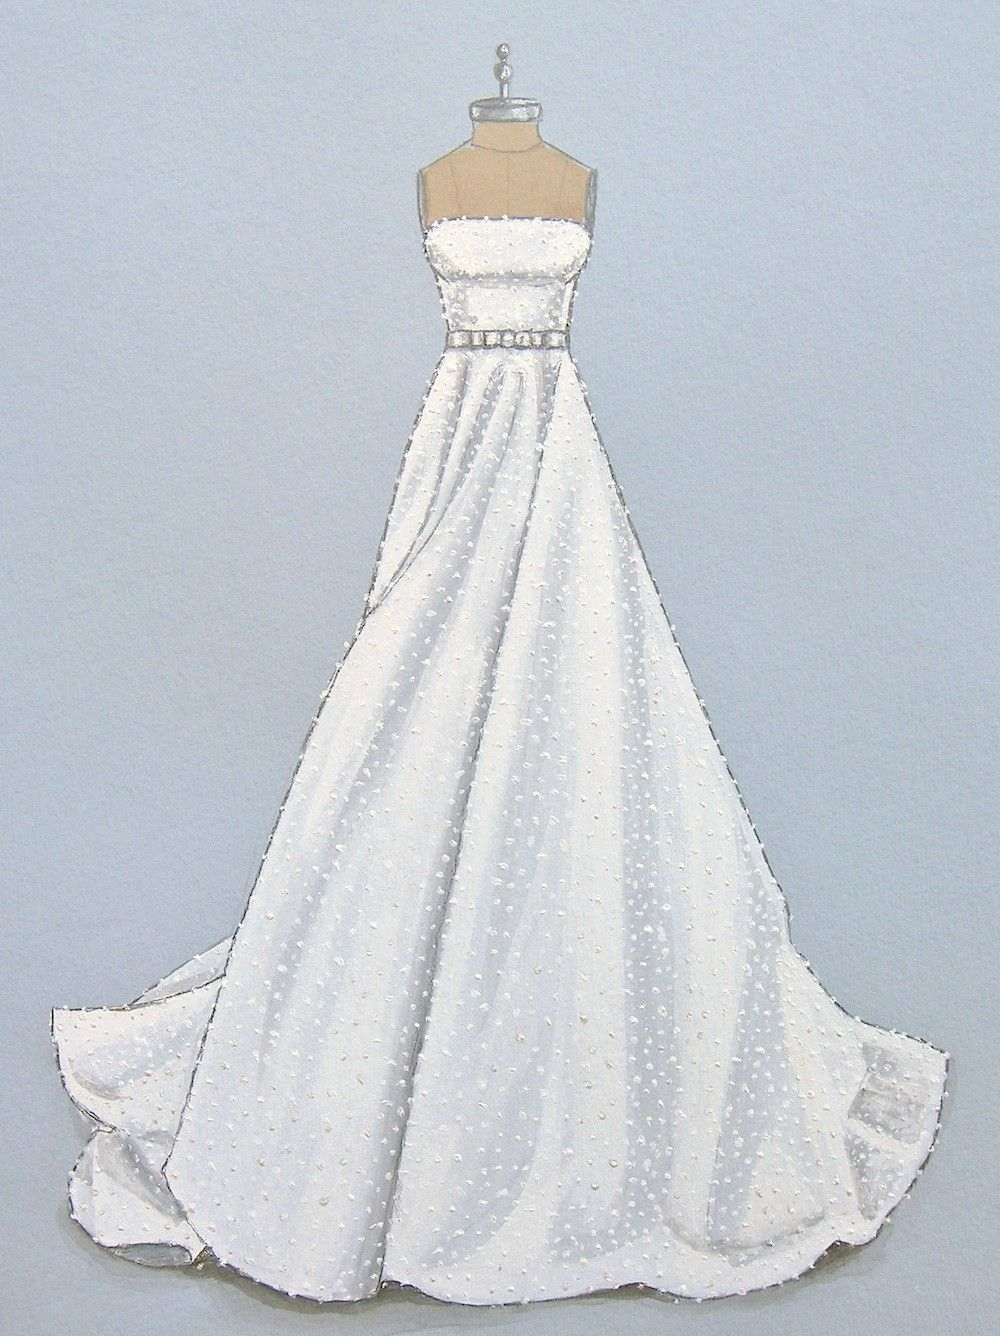 Porfolio of custom wedding dress sketches and illustrations for